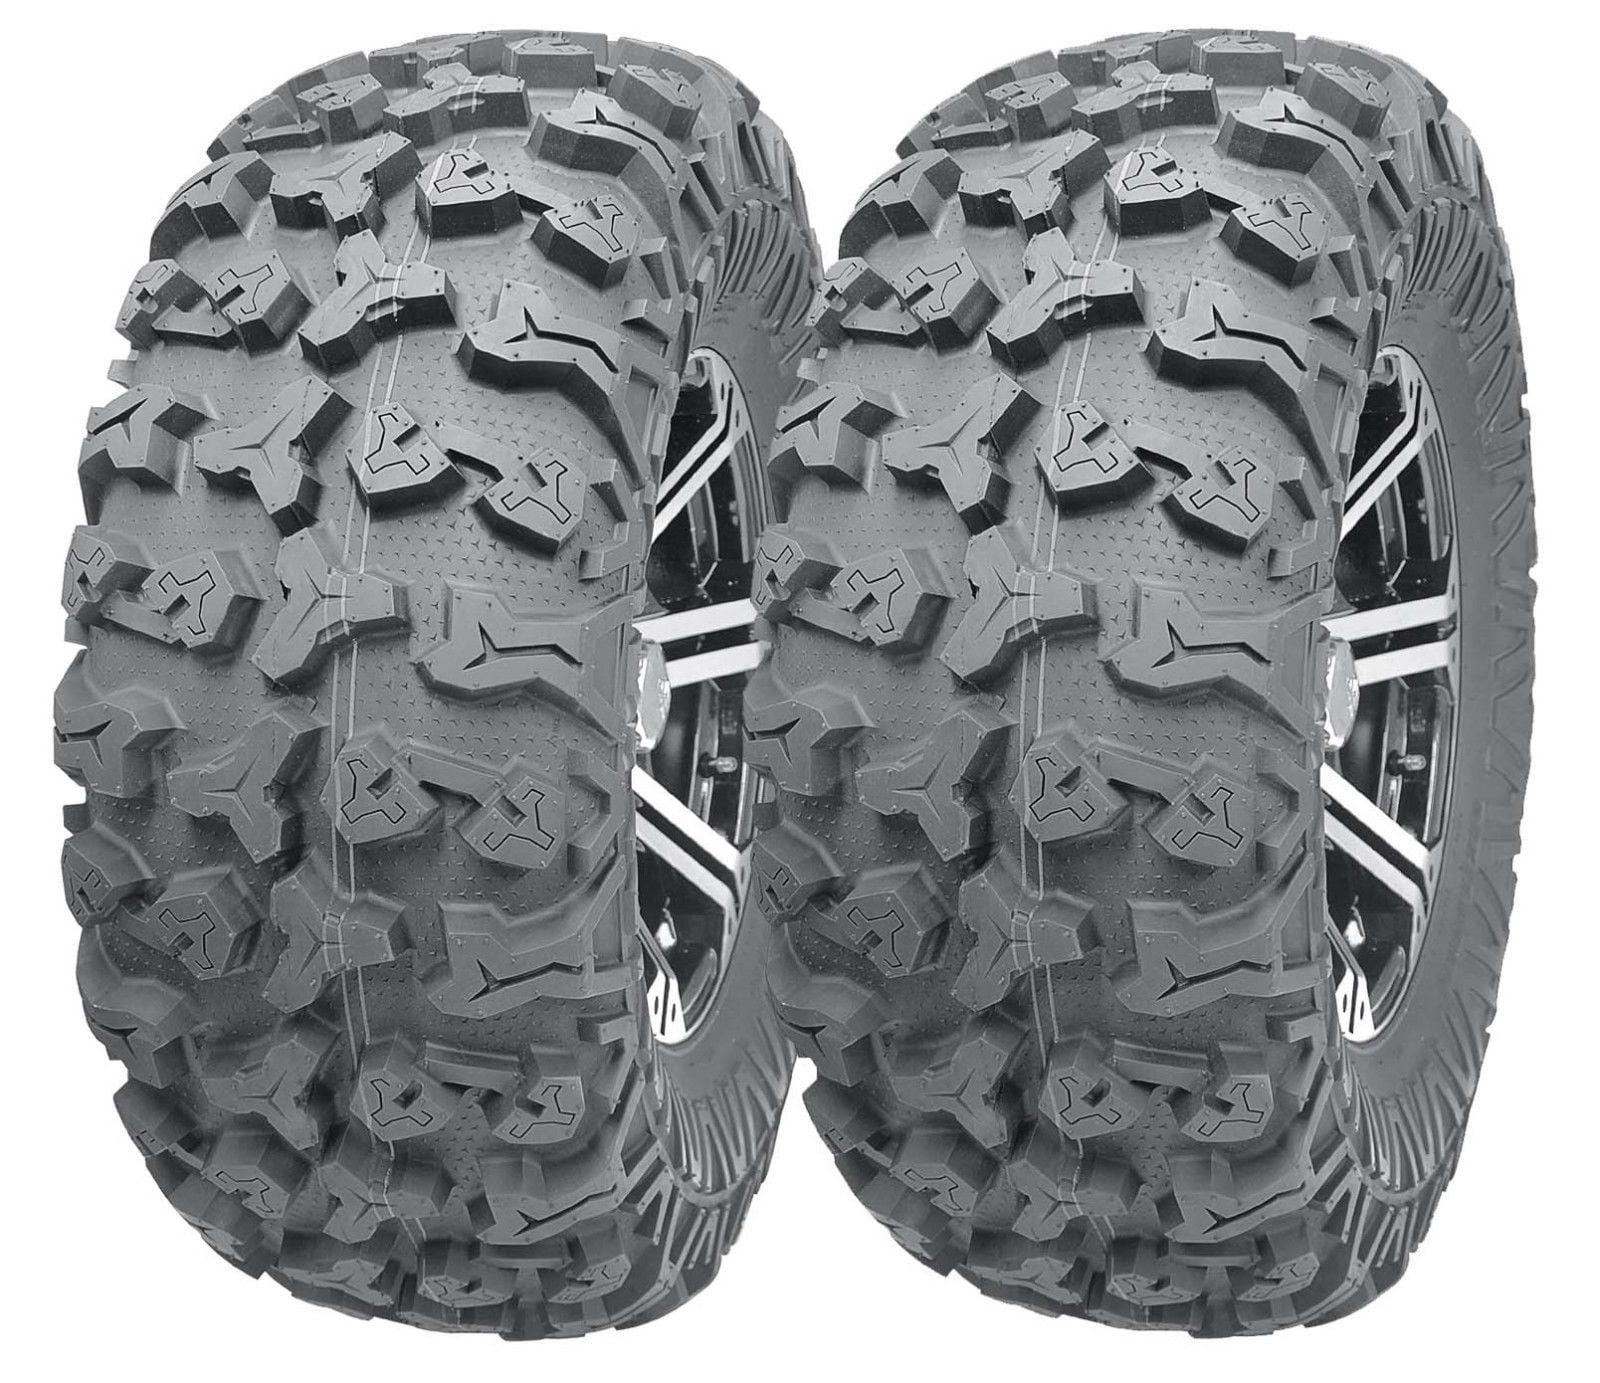 2 WANDA ATV Front Tire Set 23x7-10 for 96-09 Polaris Trail Blazer 250 330 400